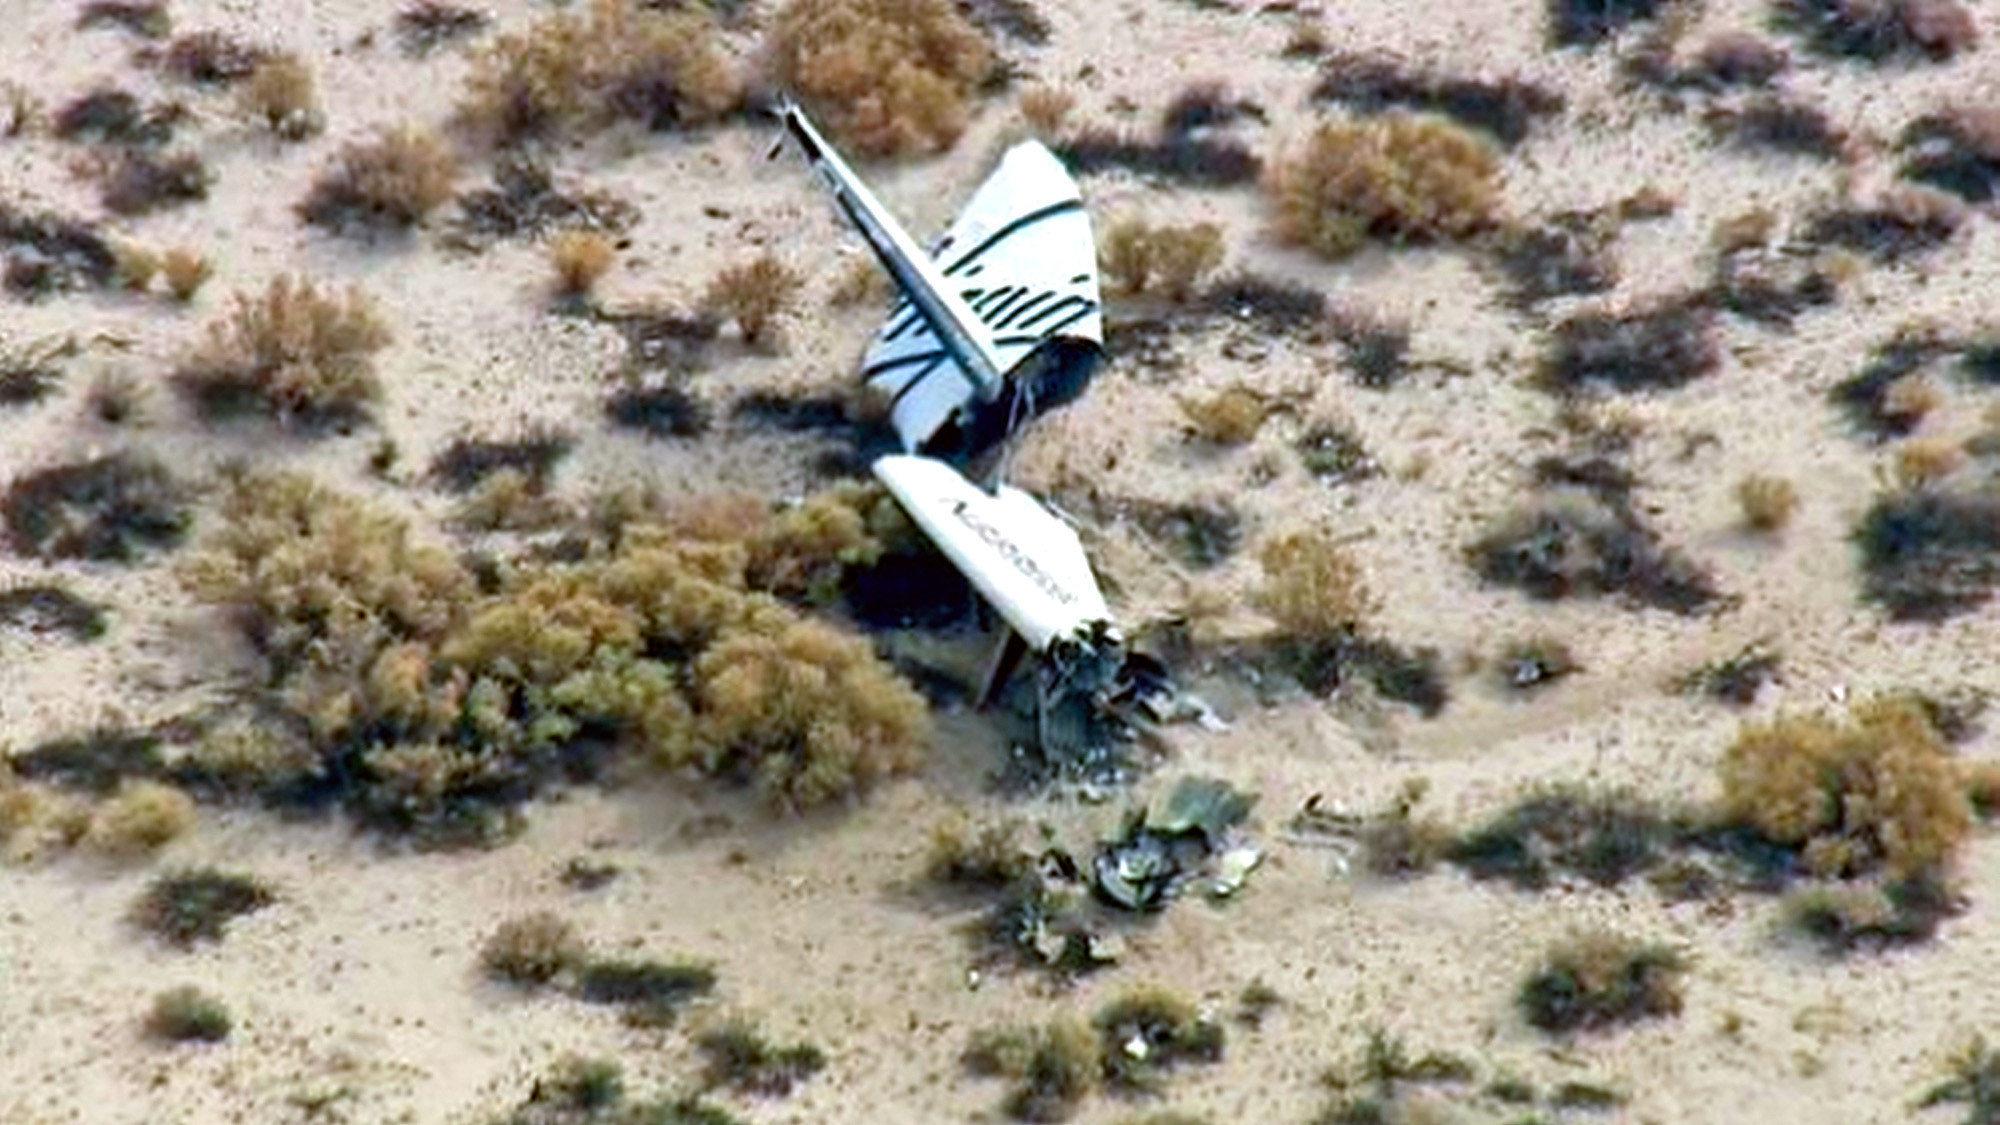 'Tough day' for space travel as Virgin Galactic's spaceship crashes